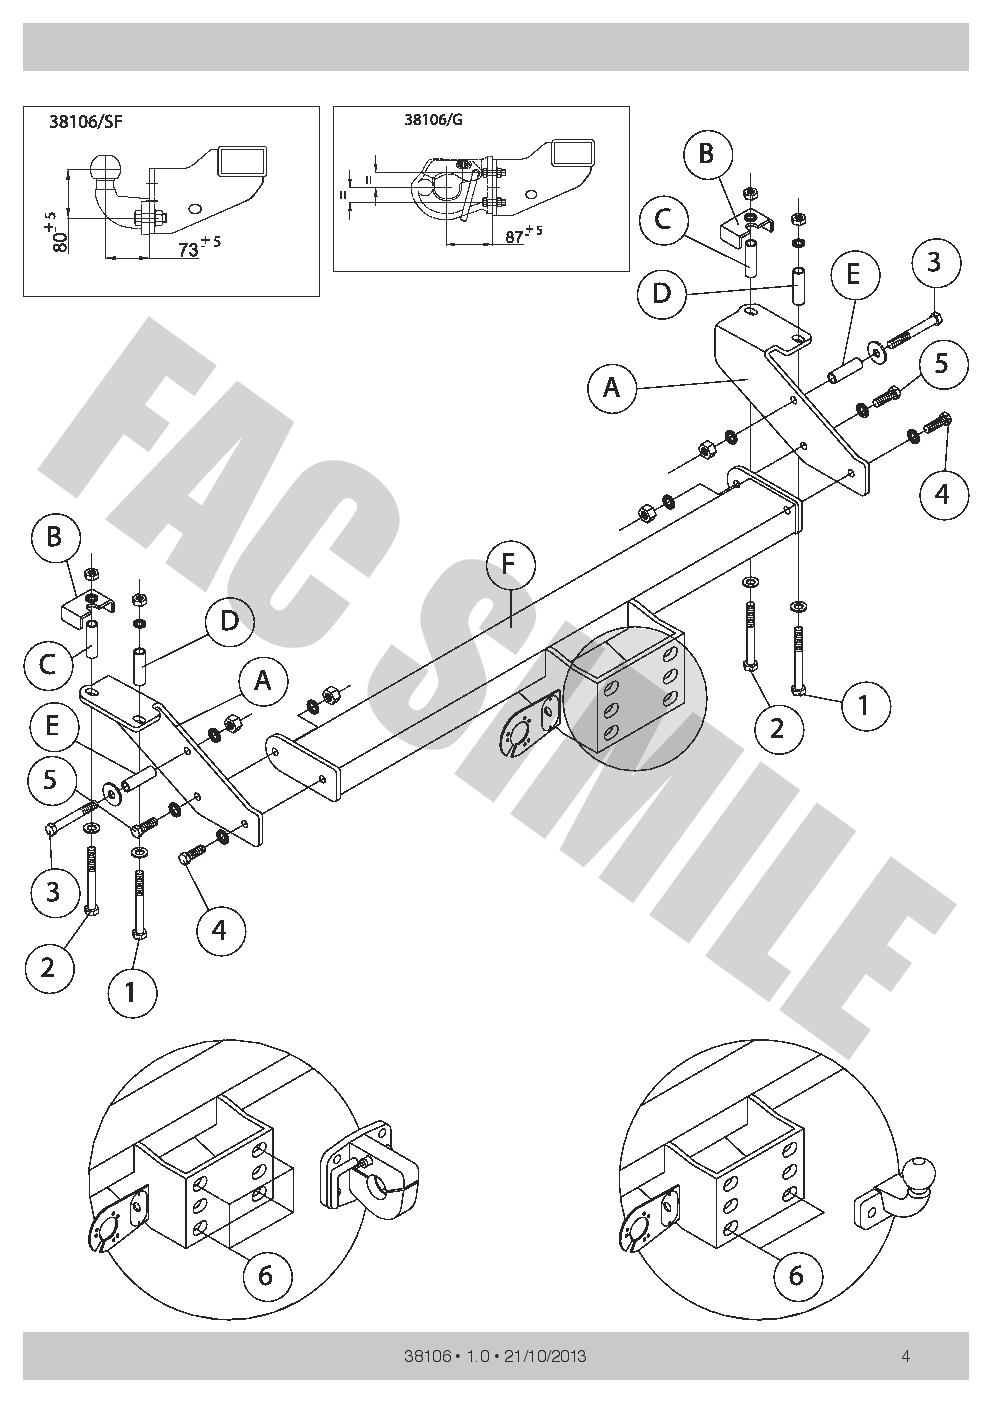 Fixed Flange Towbar Manual Car Tow Bar for Tata Xenon